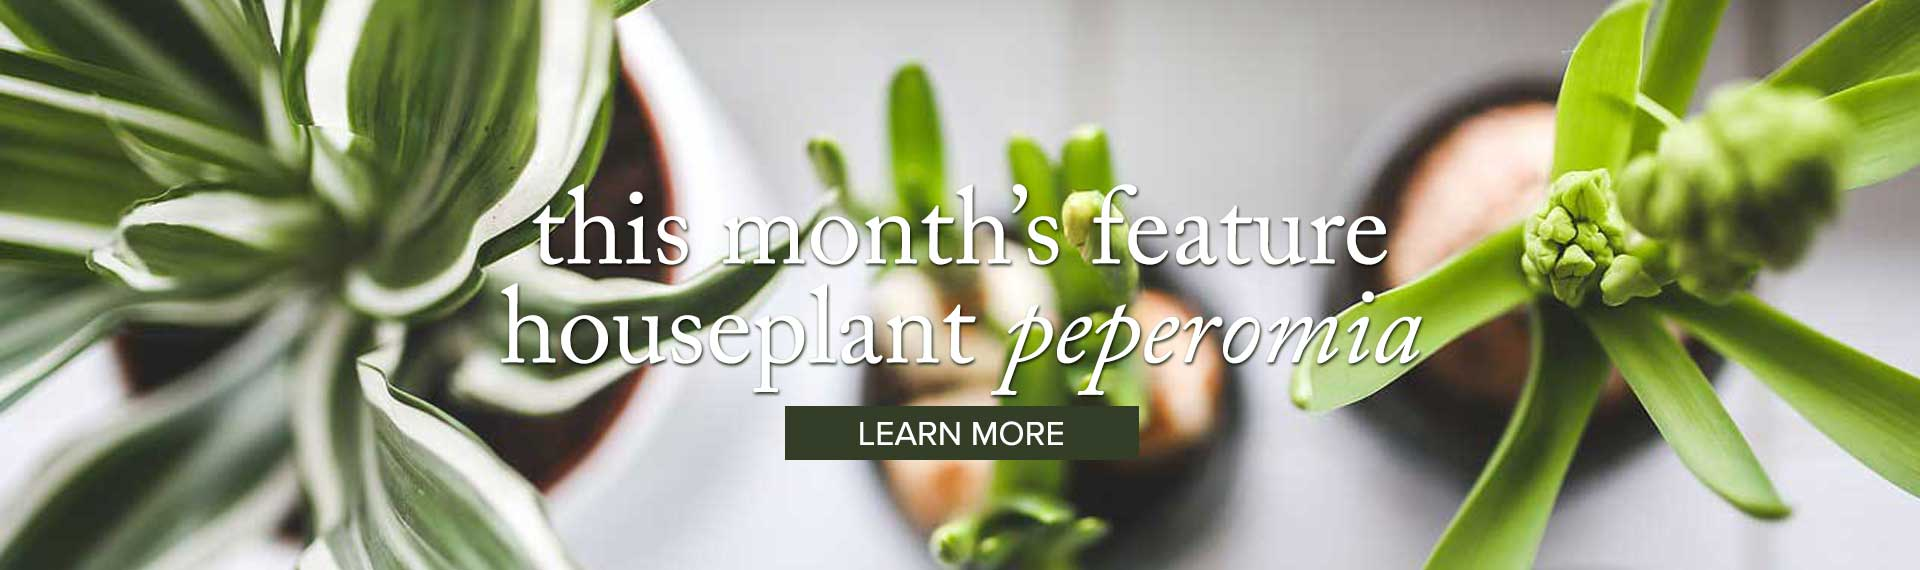 houseplant_LEARN